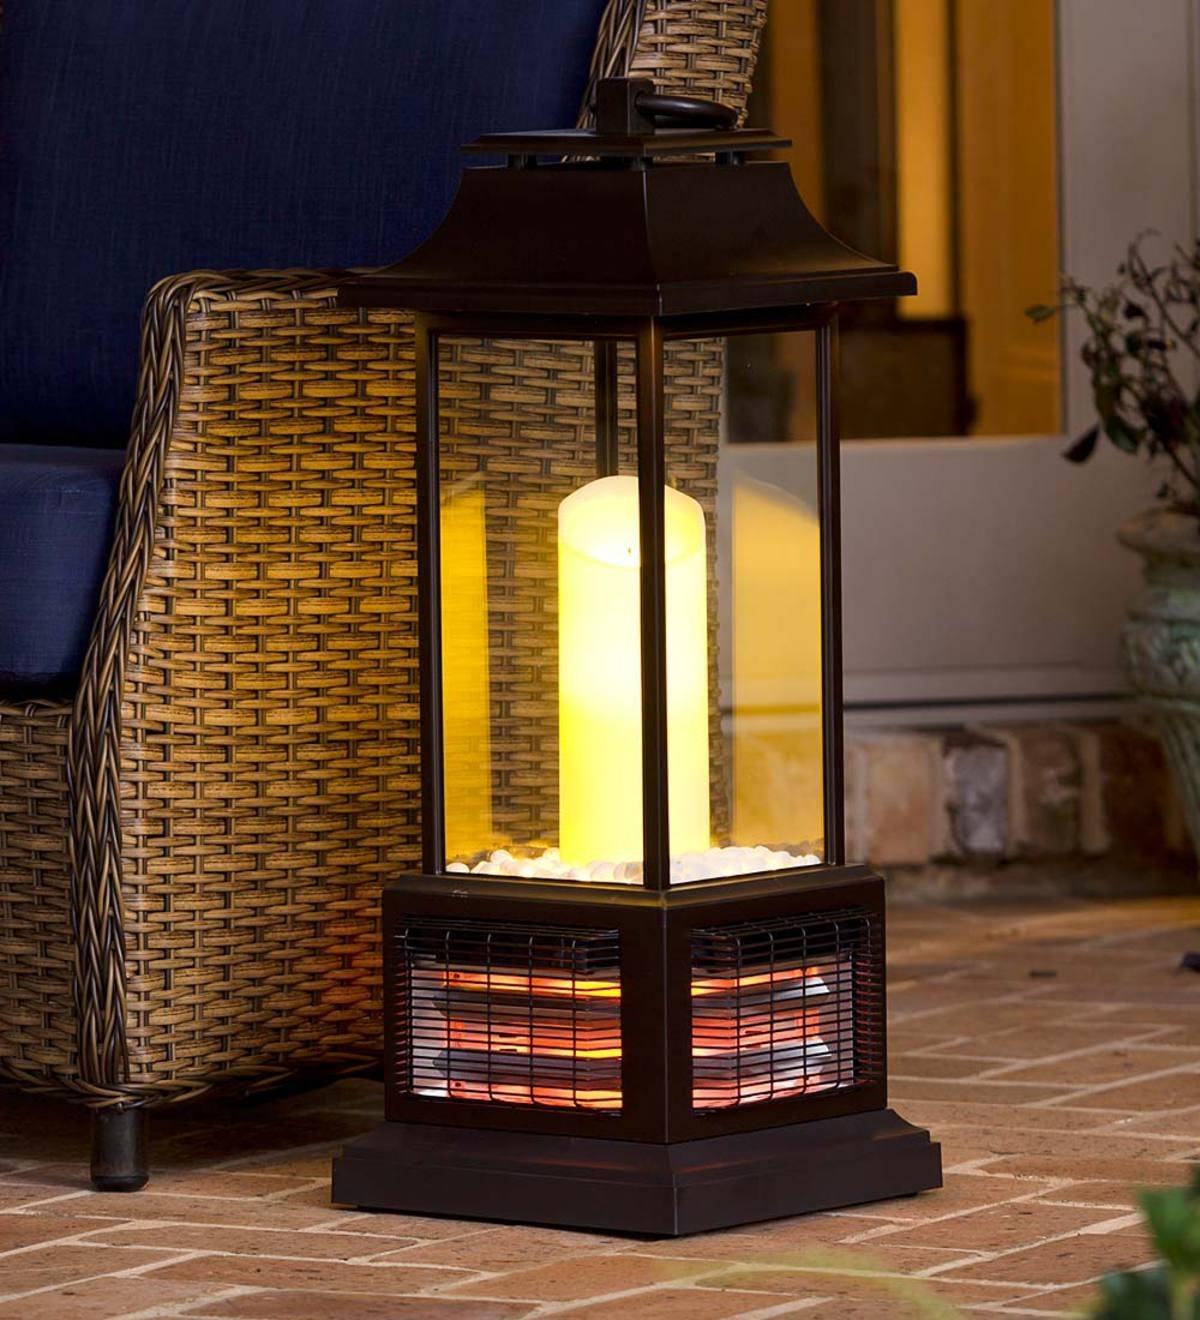 Outdoor Infrared Lantern Heater | Outdoor Lamps & Lighting | Deck Regarding Outdoor Lawn Lanterns (View 11 of 20)